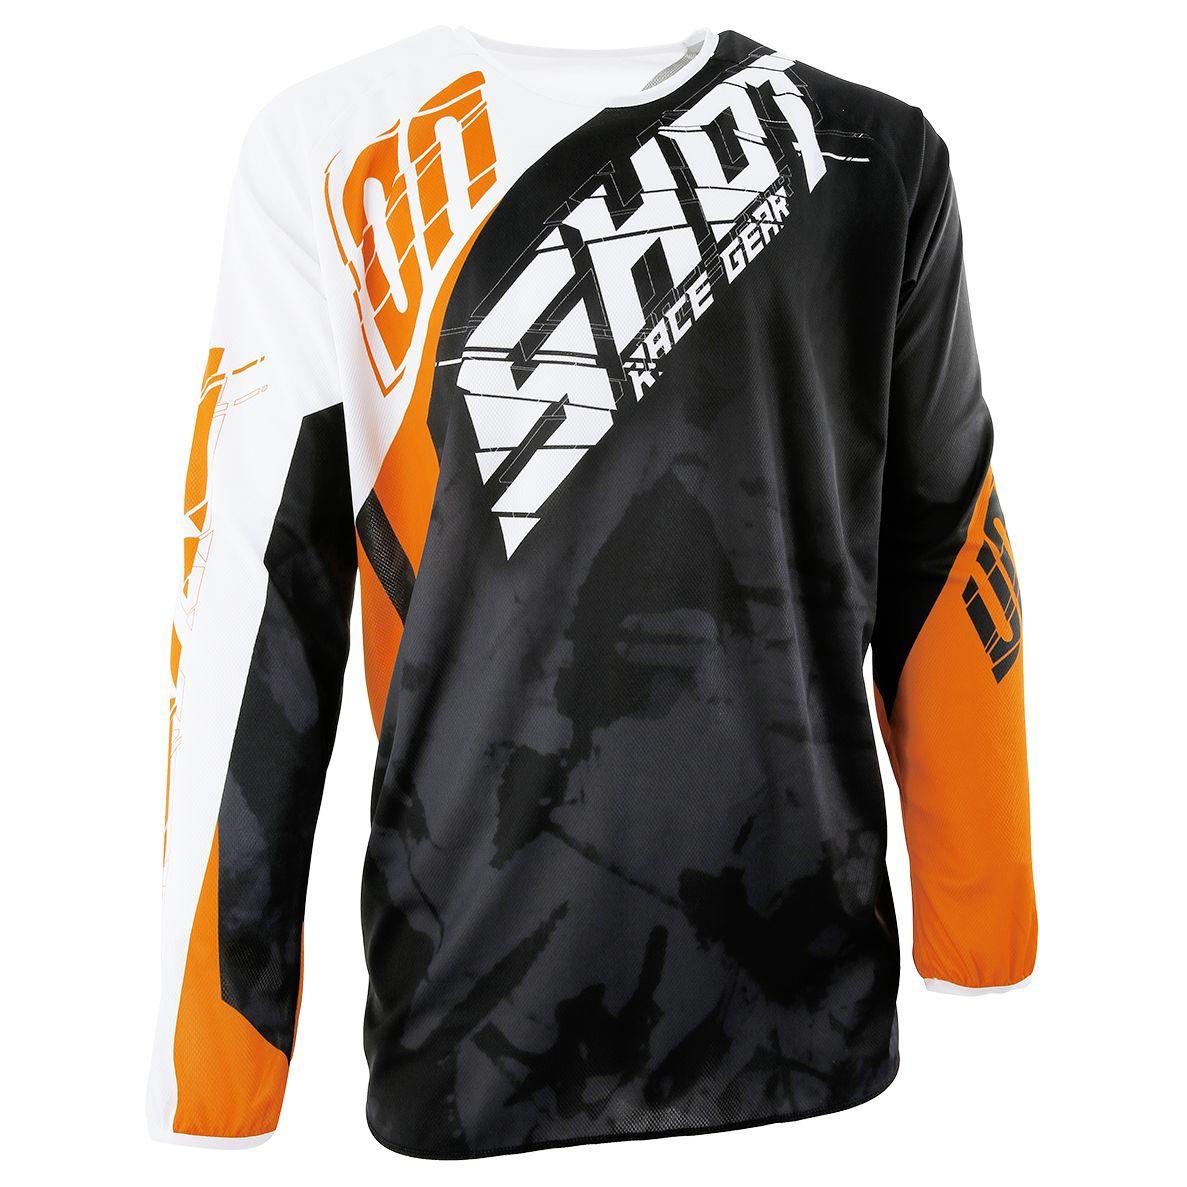 b5ea4f46a5b Camiseta de motocross Shot outlet DEVO SQUAD NARANJA 2017 - Motoblouz.es